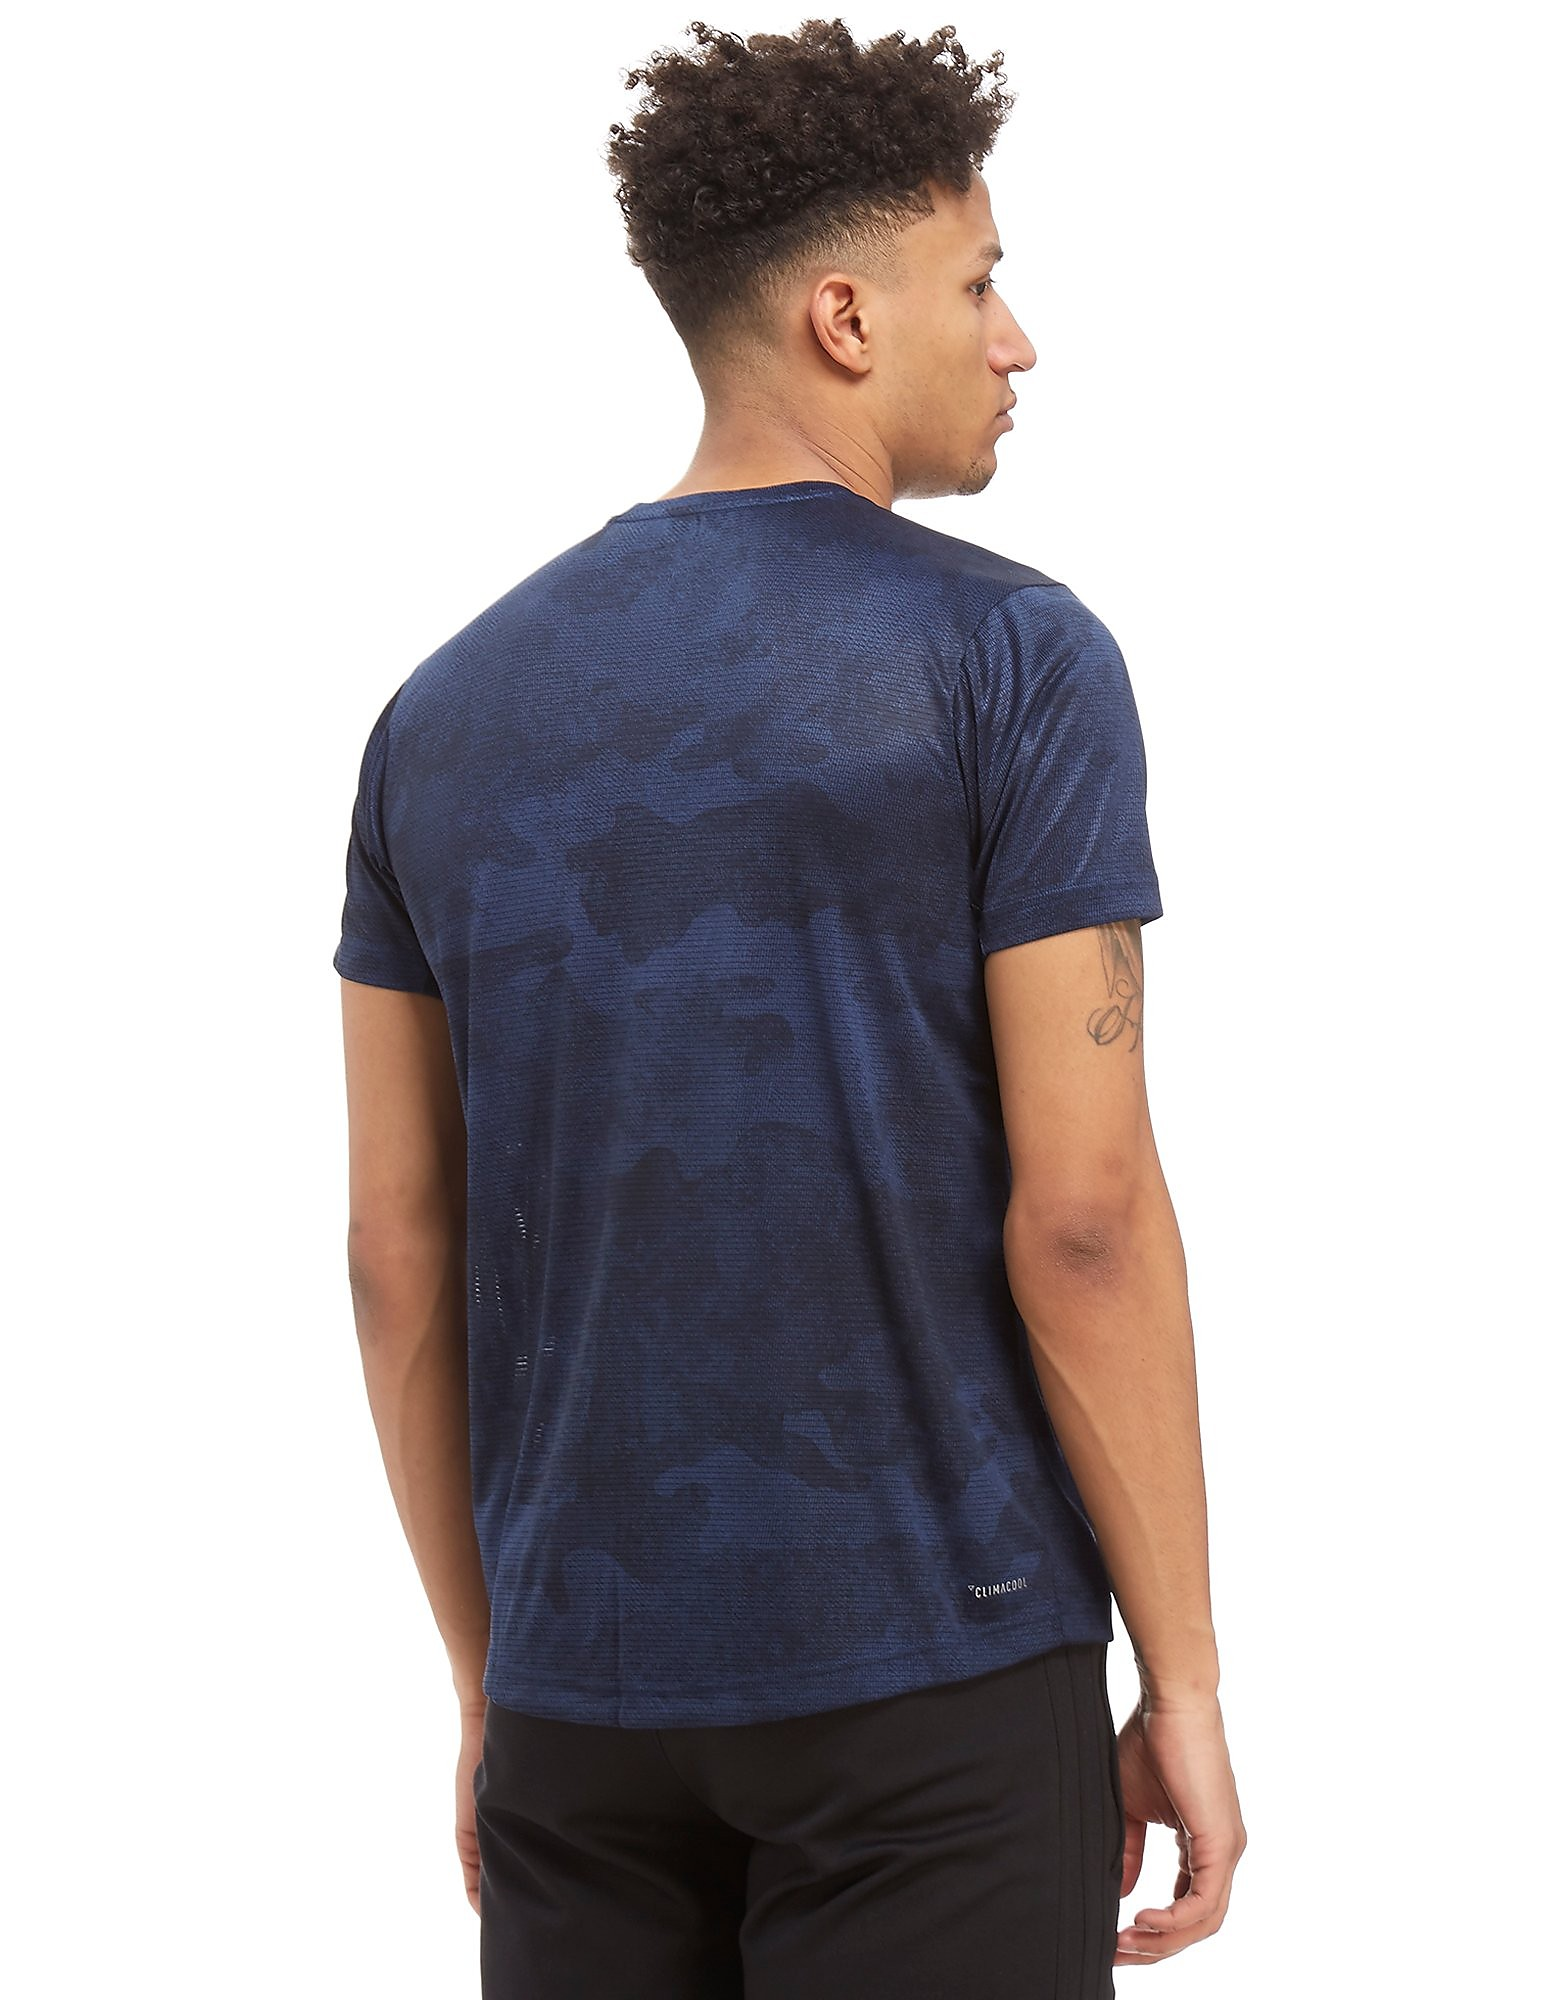 adidas Climacool Camo T-Shirt